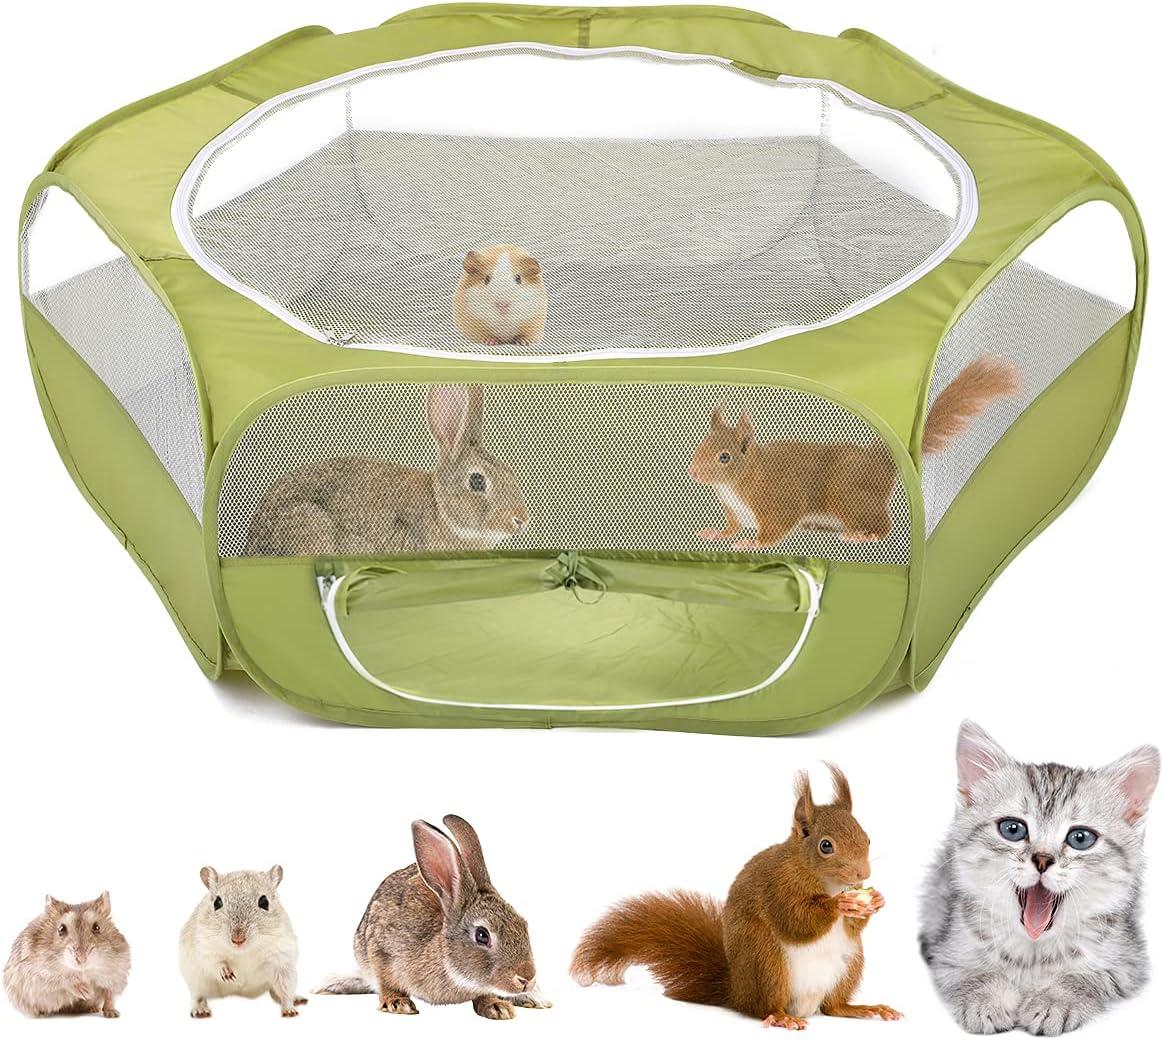 VavoPaw Valla Portátil de Mascotas, 190T Tafetán Parque Corral Plegable Cremallera Lateral Casa Portátil Transpirable Jaula para Perros Gatos Conejos Cachorros Animales Domésticos, Verde